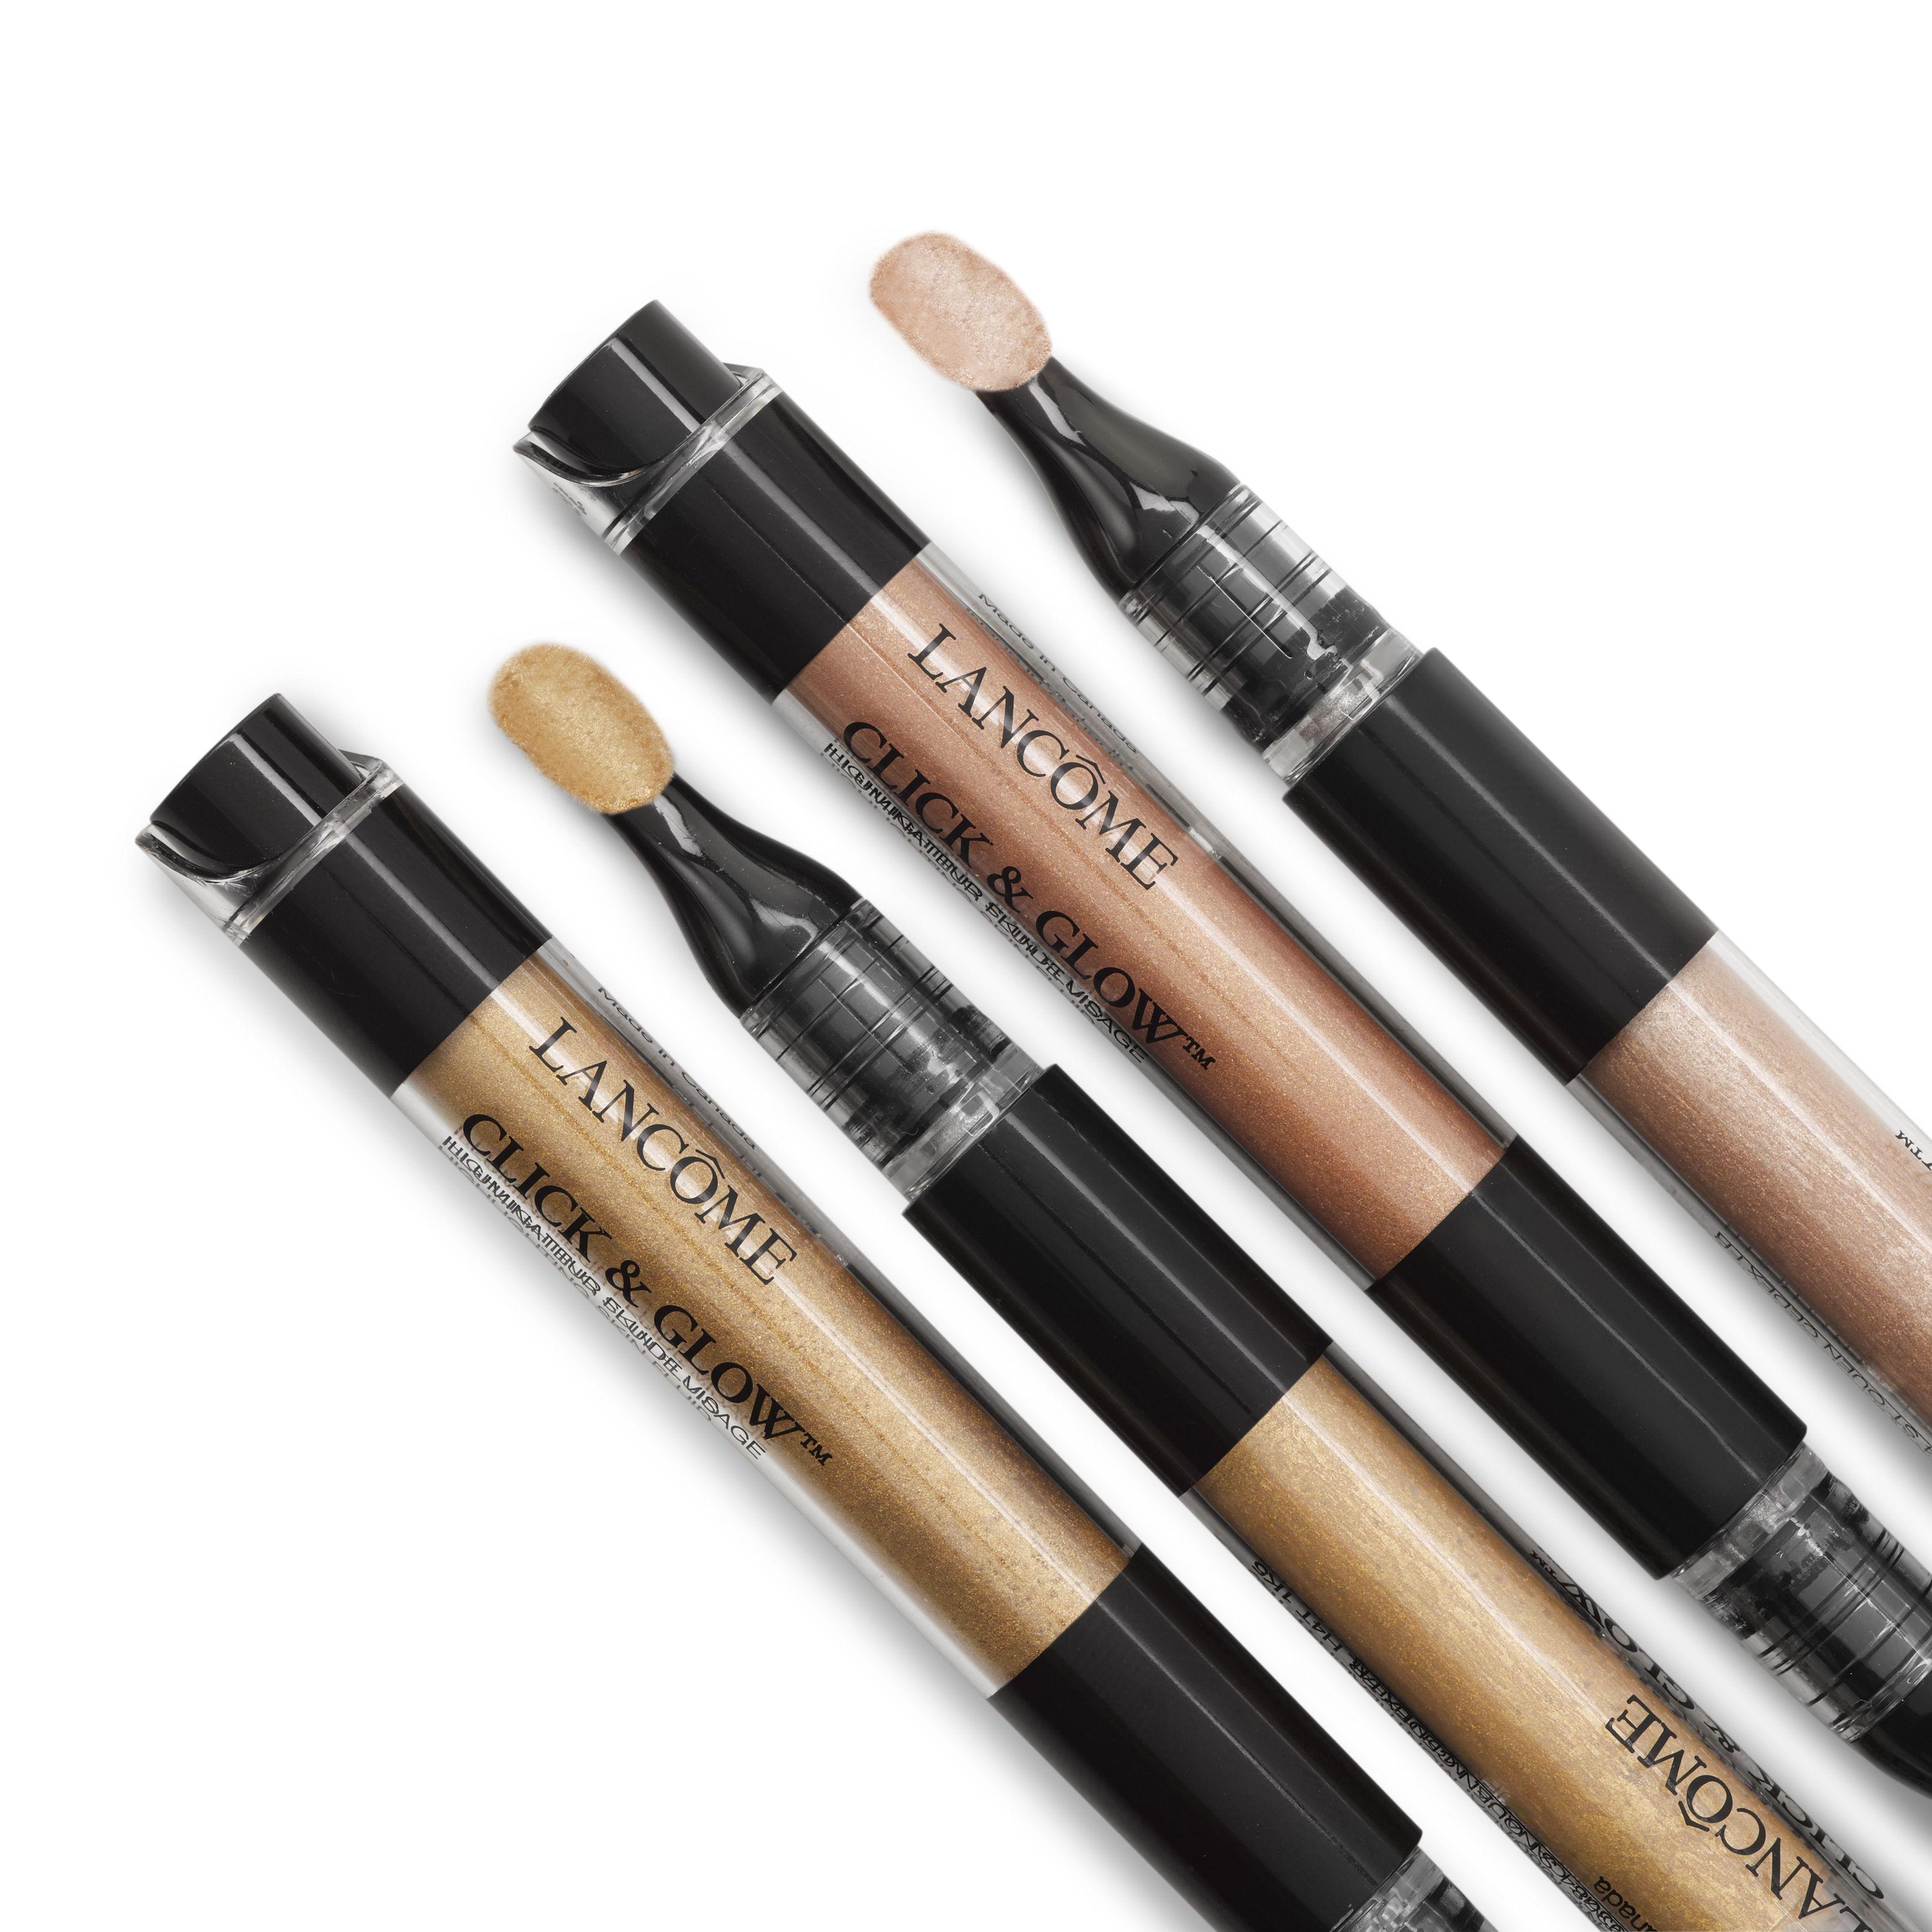 Click & Glow Liquid Highlighter Makeup, Best makeup